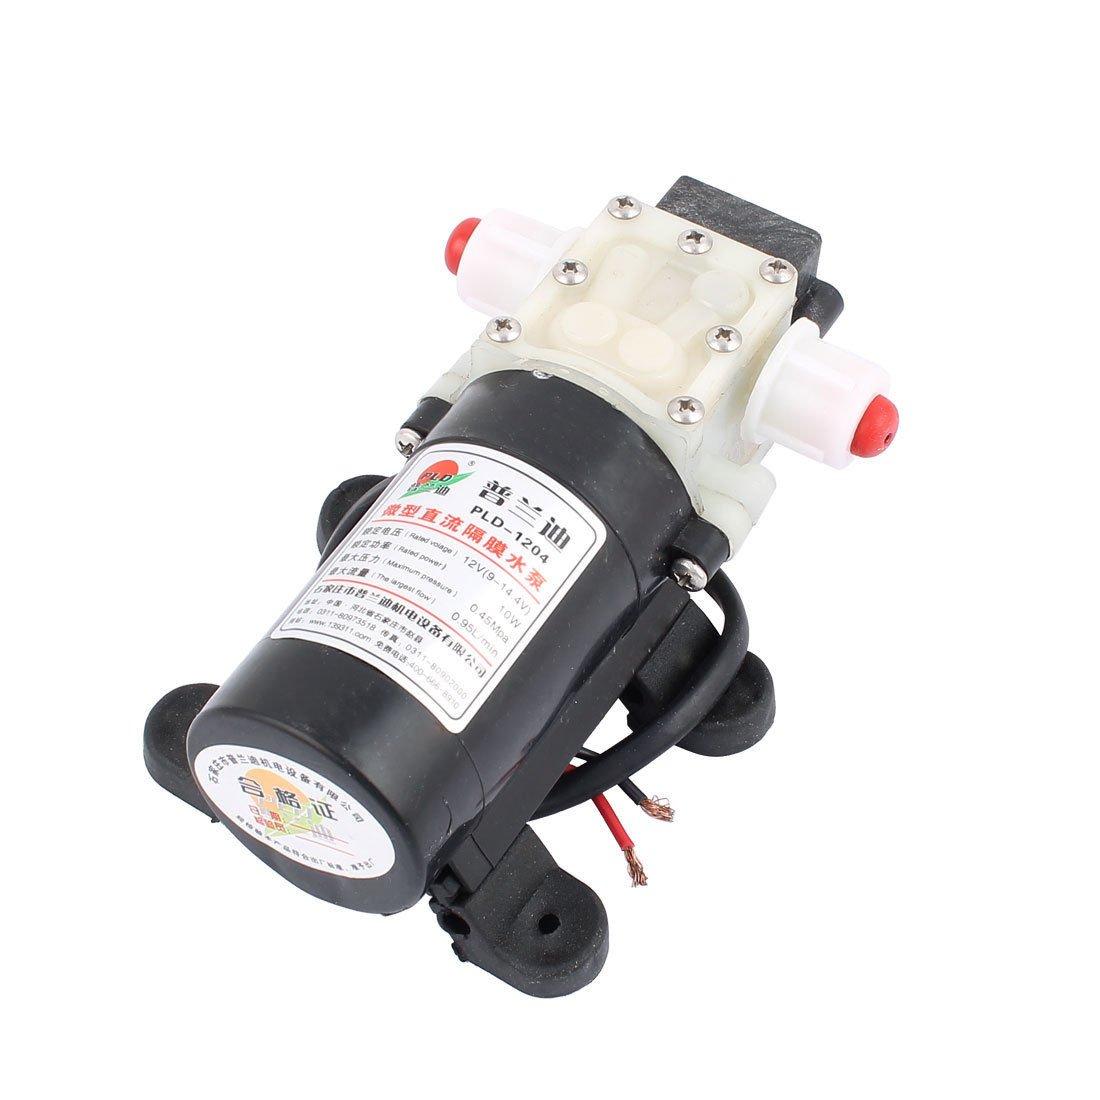 IRUI DC 12V 10W Micro Motor Pump 10mm Thread Outlet Inlet Diaphragm Pump